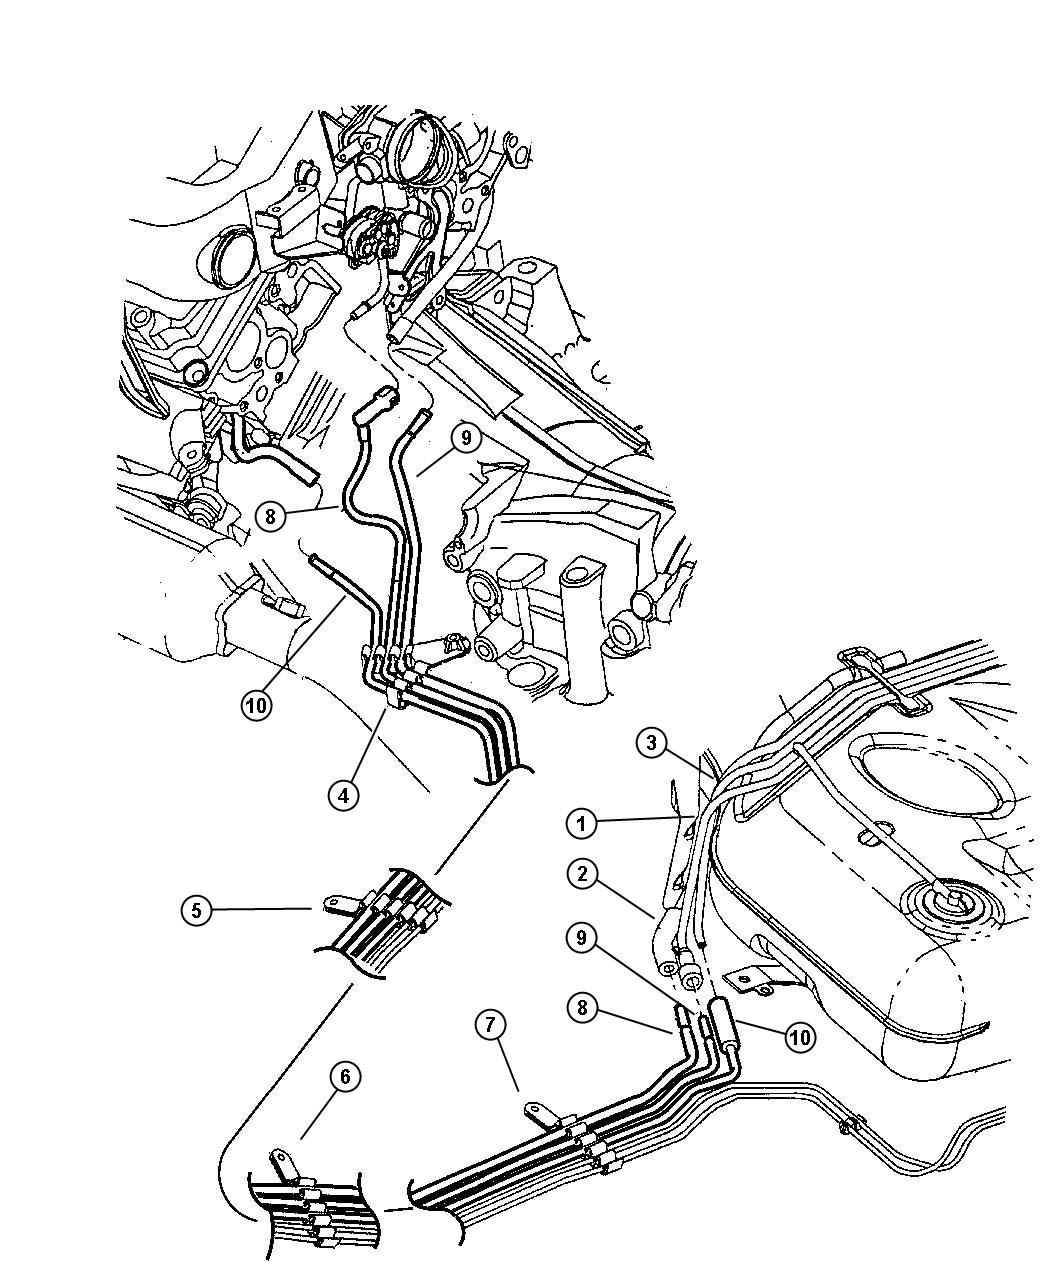 2003 suburban fuse box diagram in addition bmw 325i oil filter further cadillac emission pump location